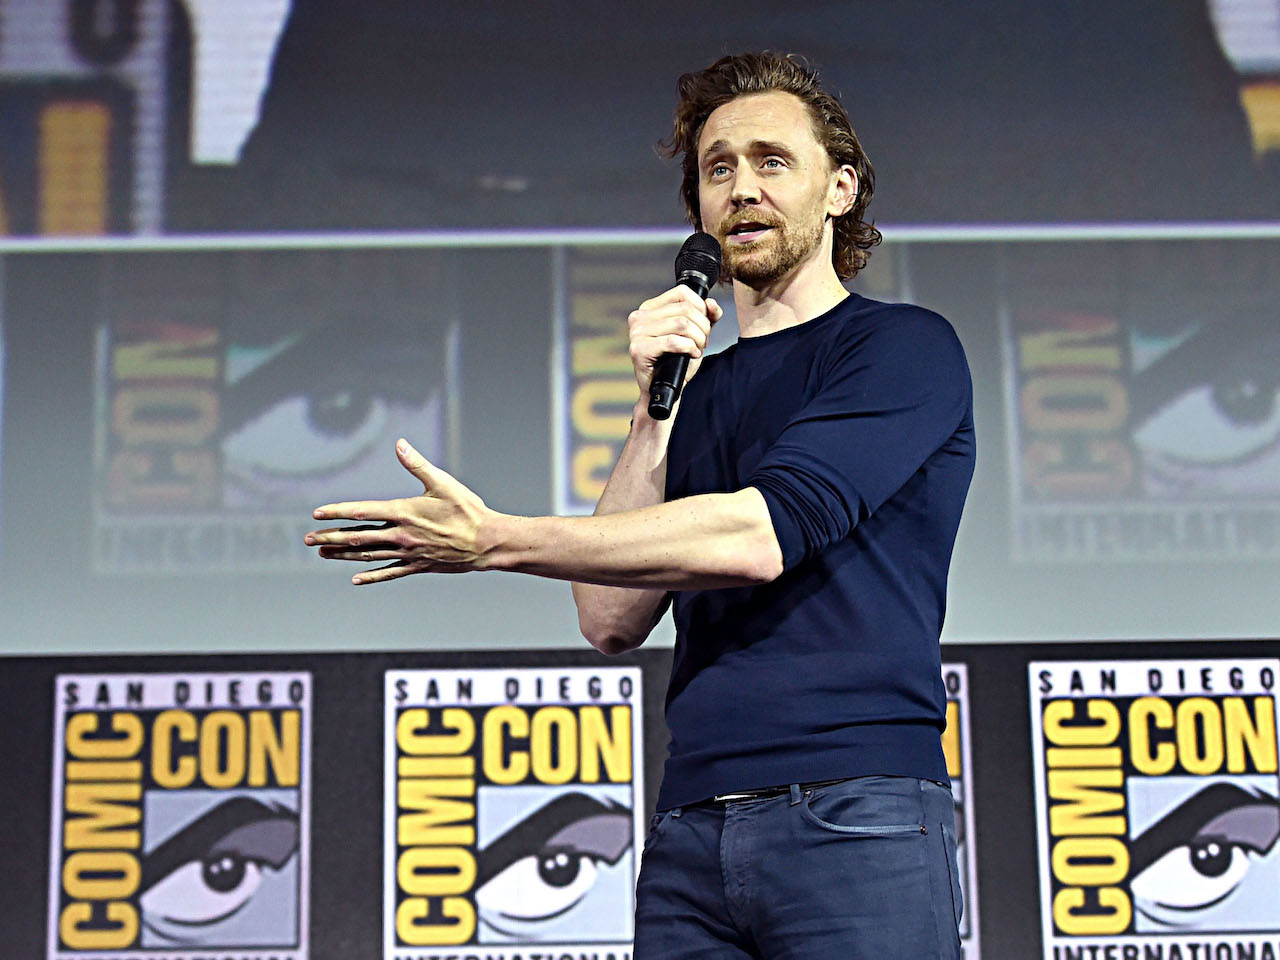 Tom Hiddleston of Marvel Studios' 'Loki' at the San Diego Comic-Con International 2019 Marvel Studios Panel